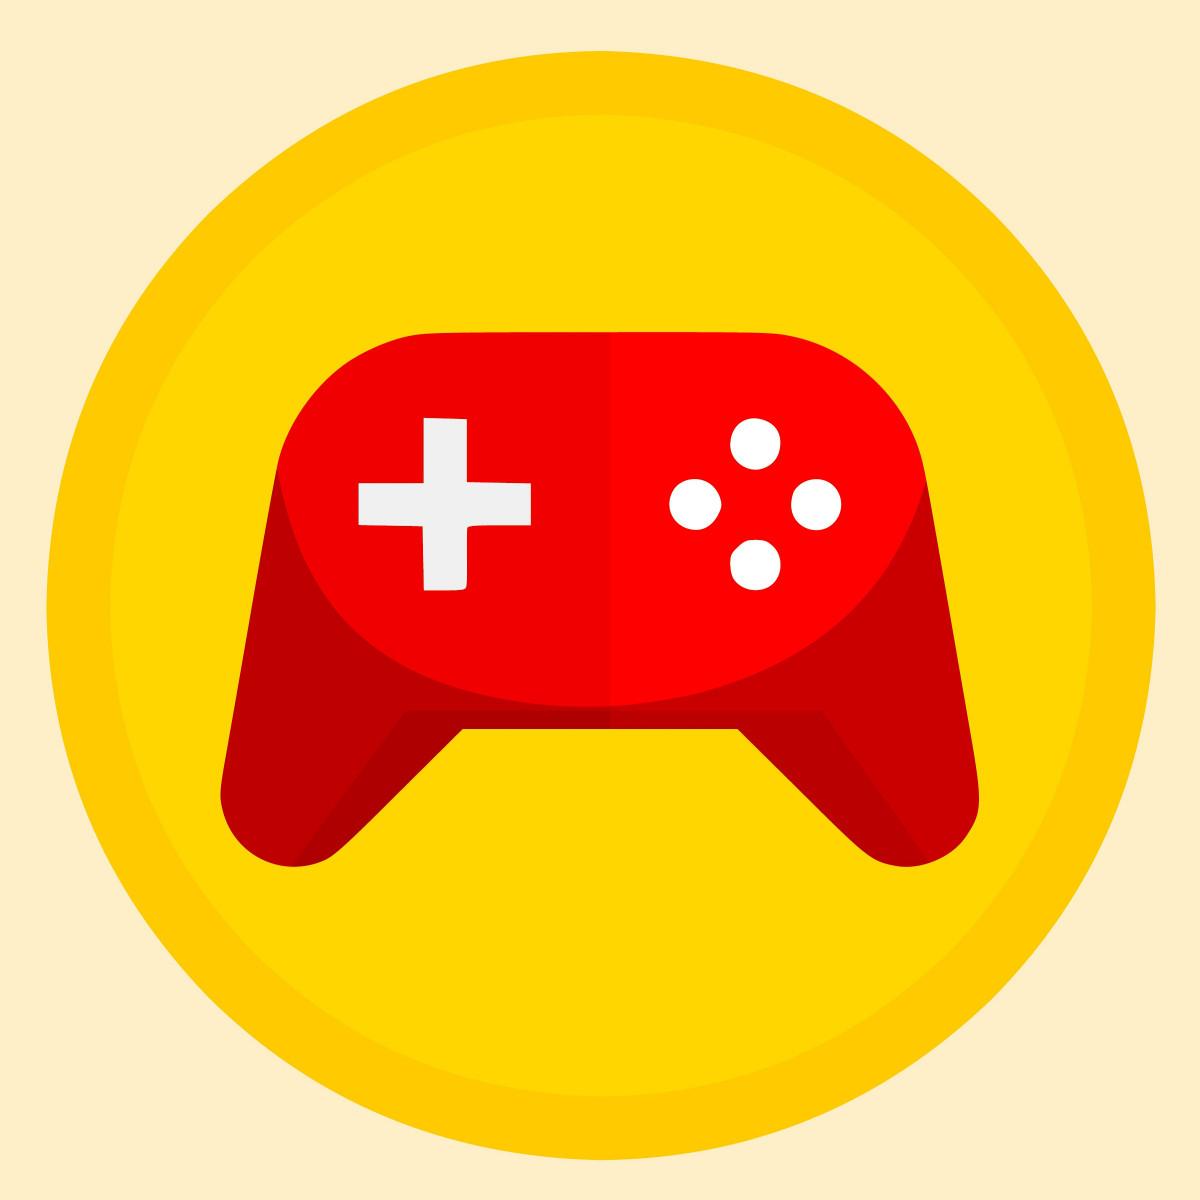 manette gaming